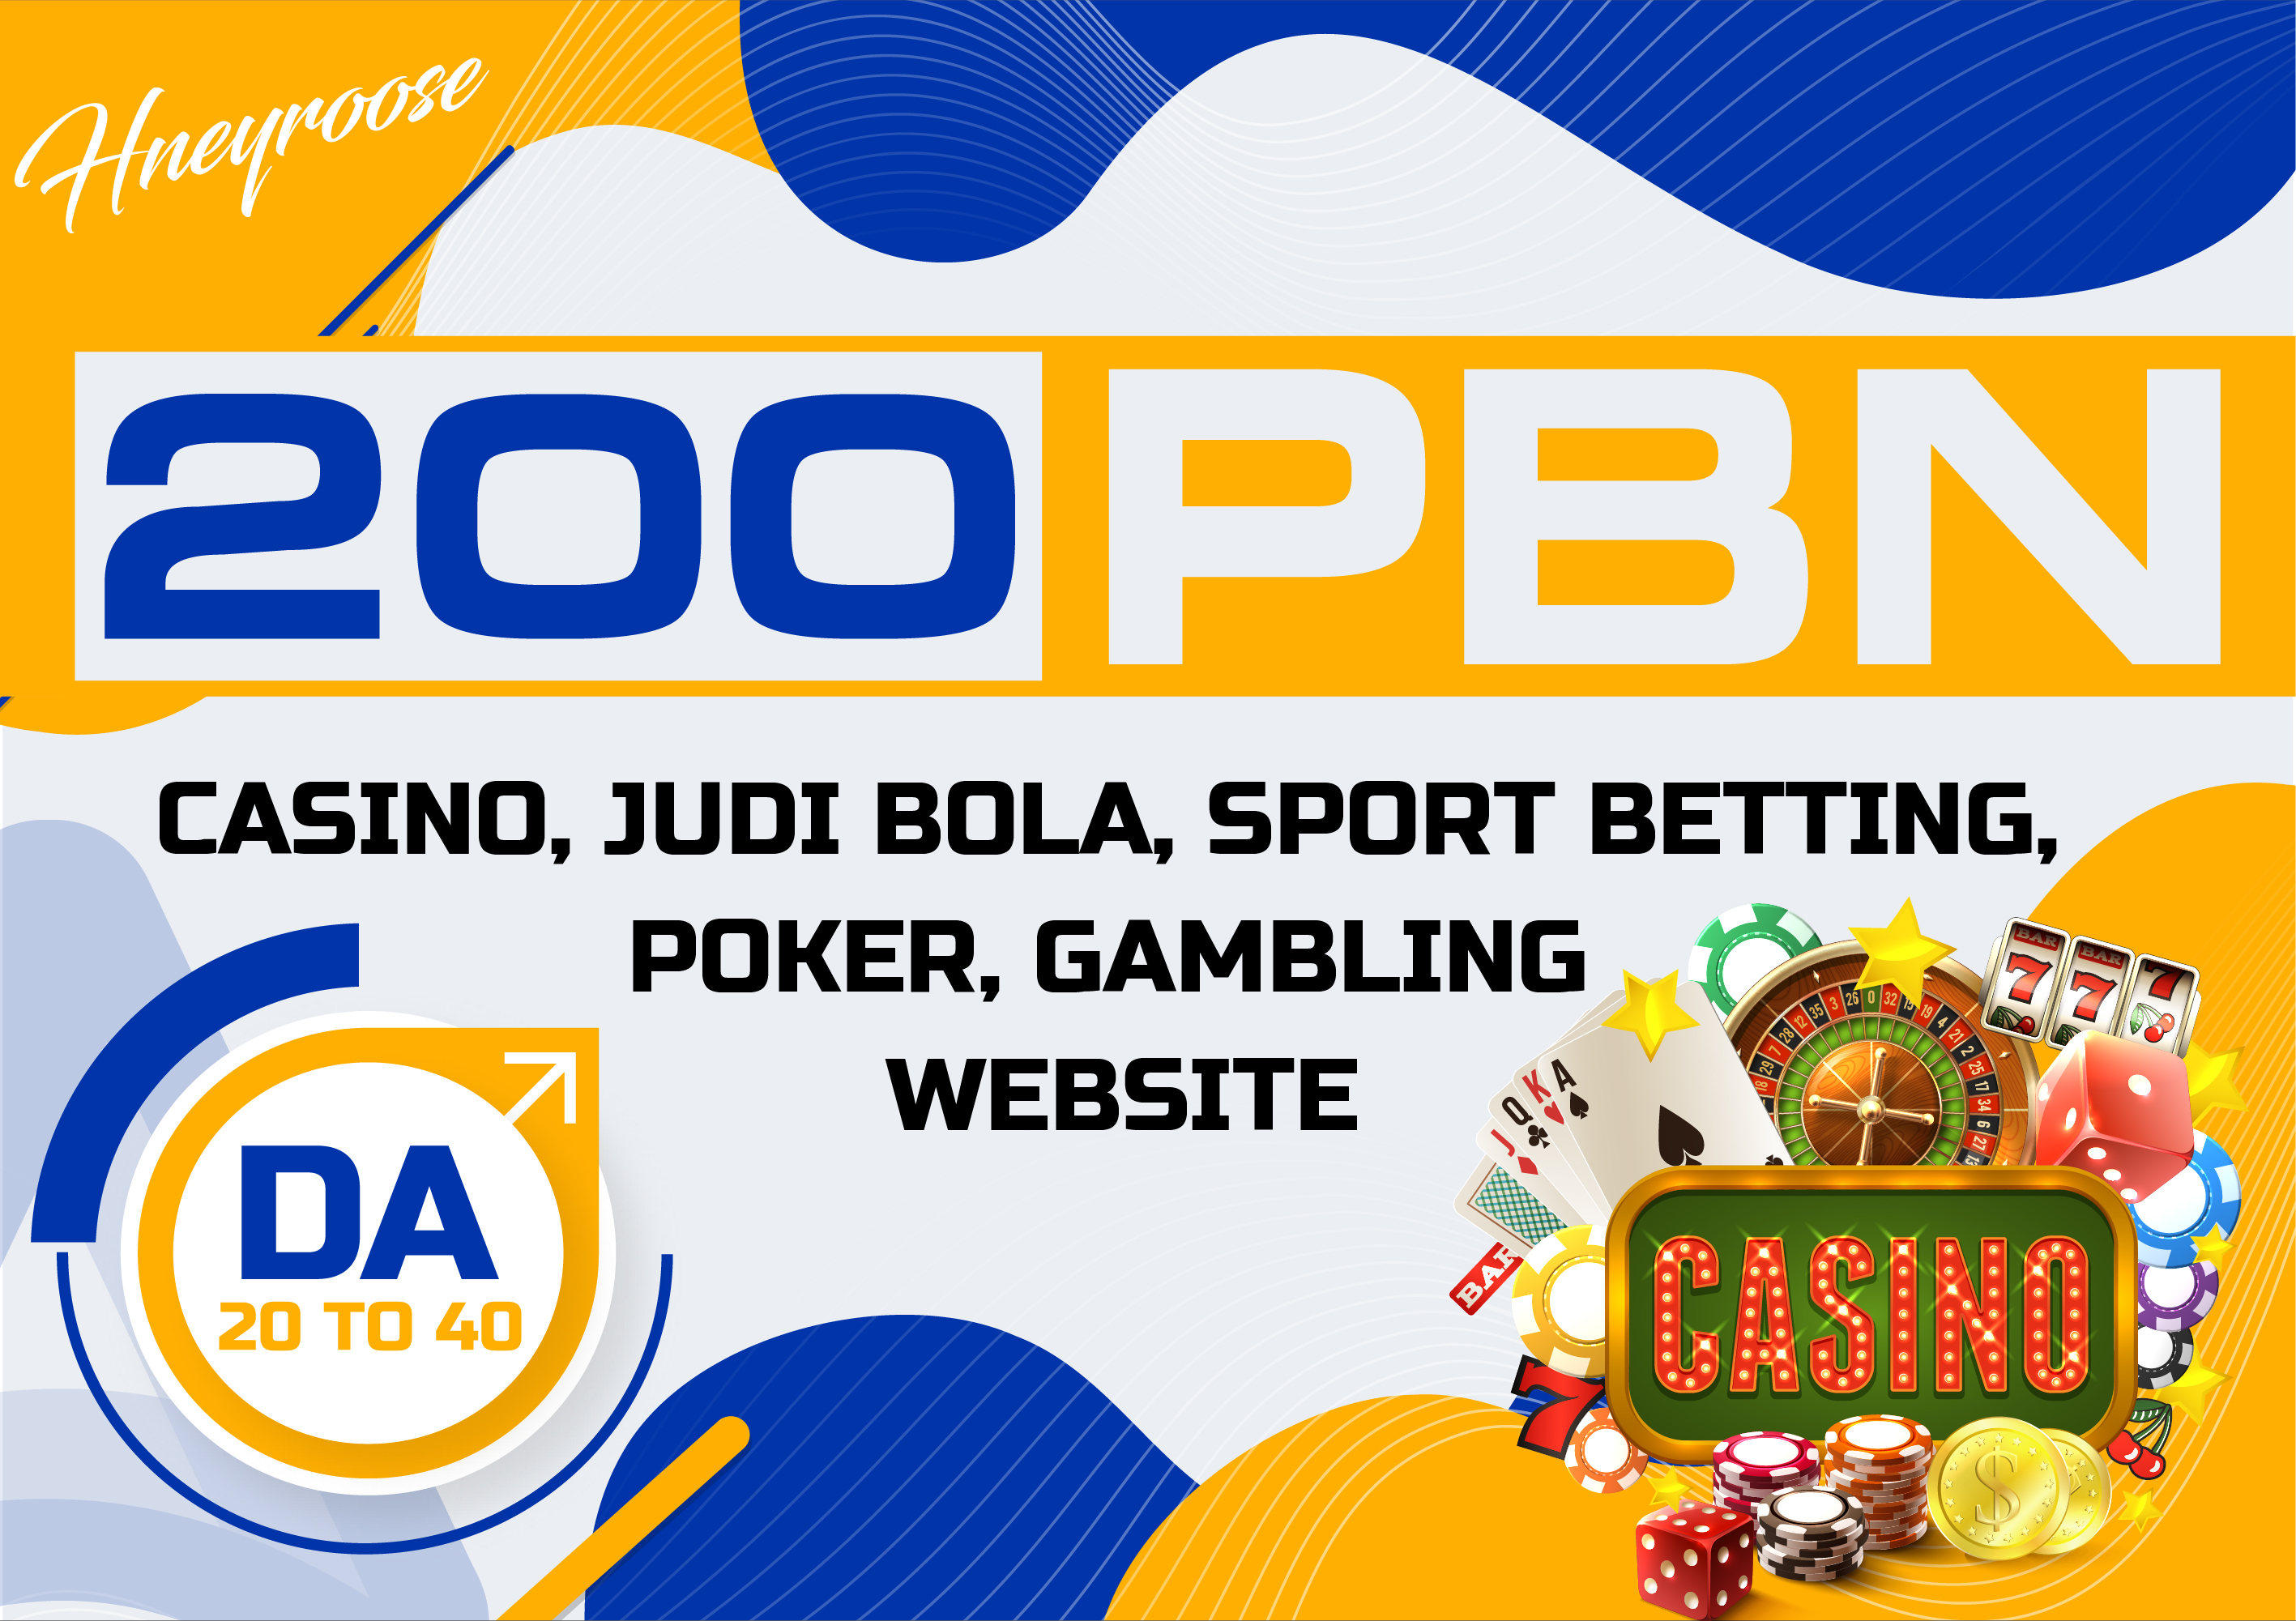 Top quality 200 CASINO/ Poker/Gambling PBN Unique Backlinks